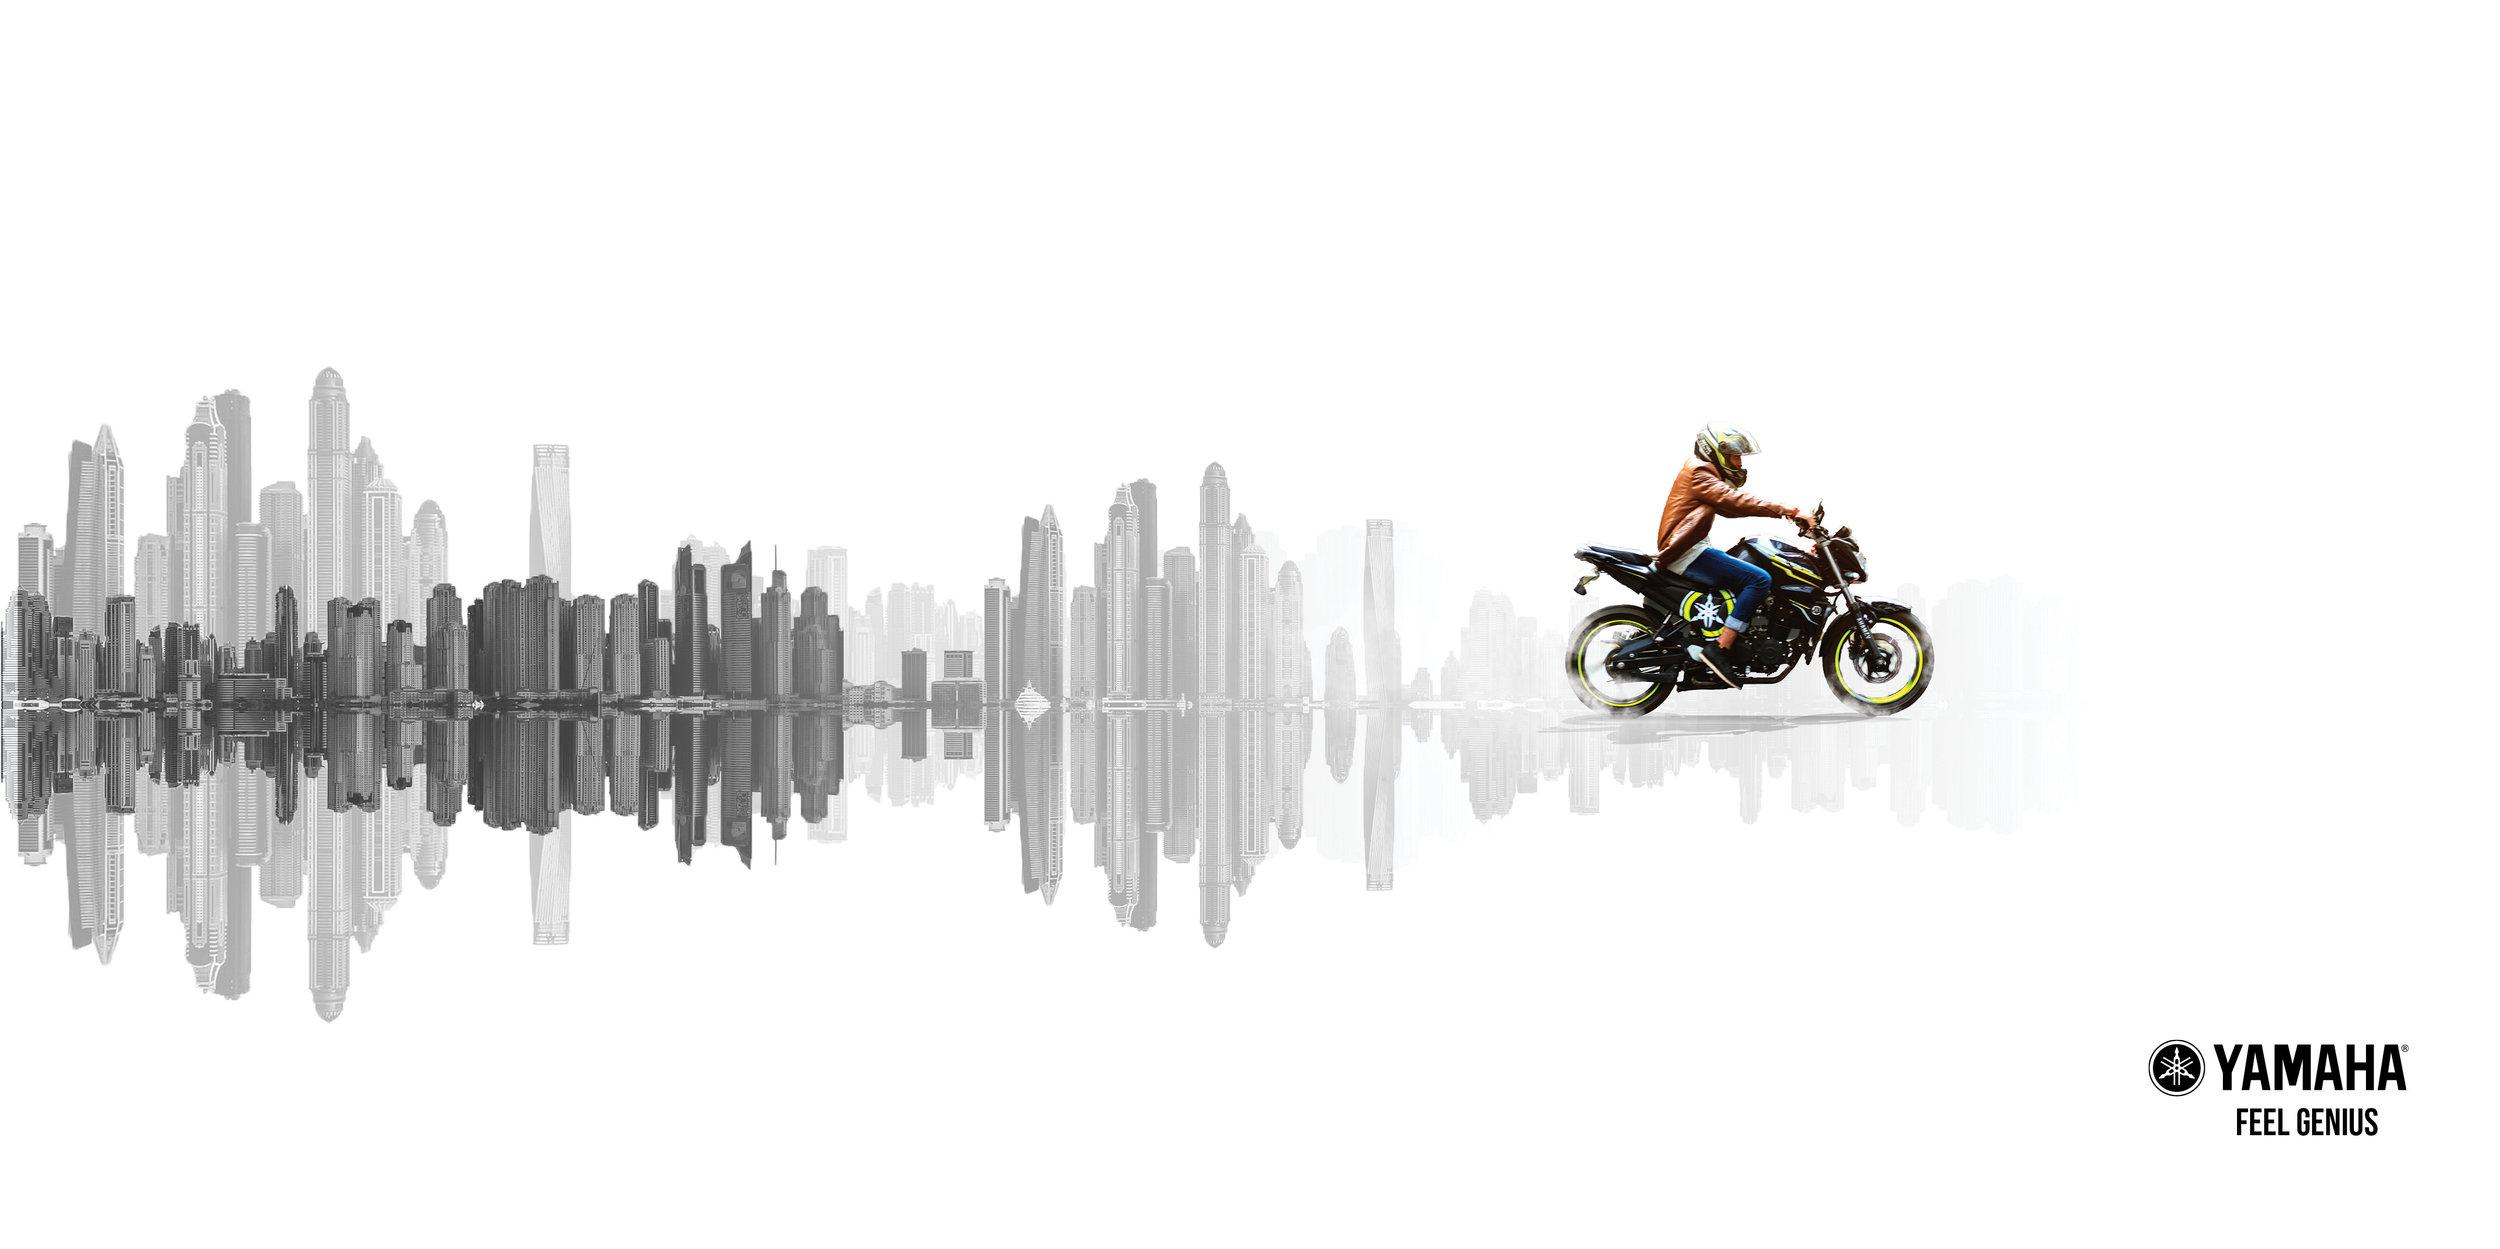 Yamaha_bike.jpg